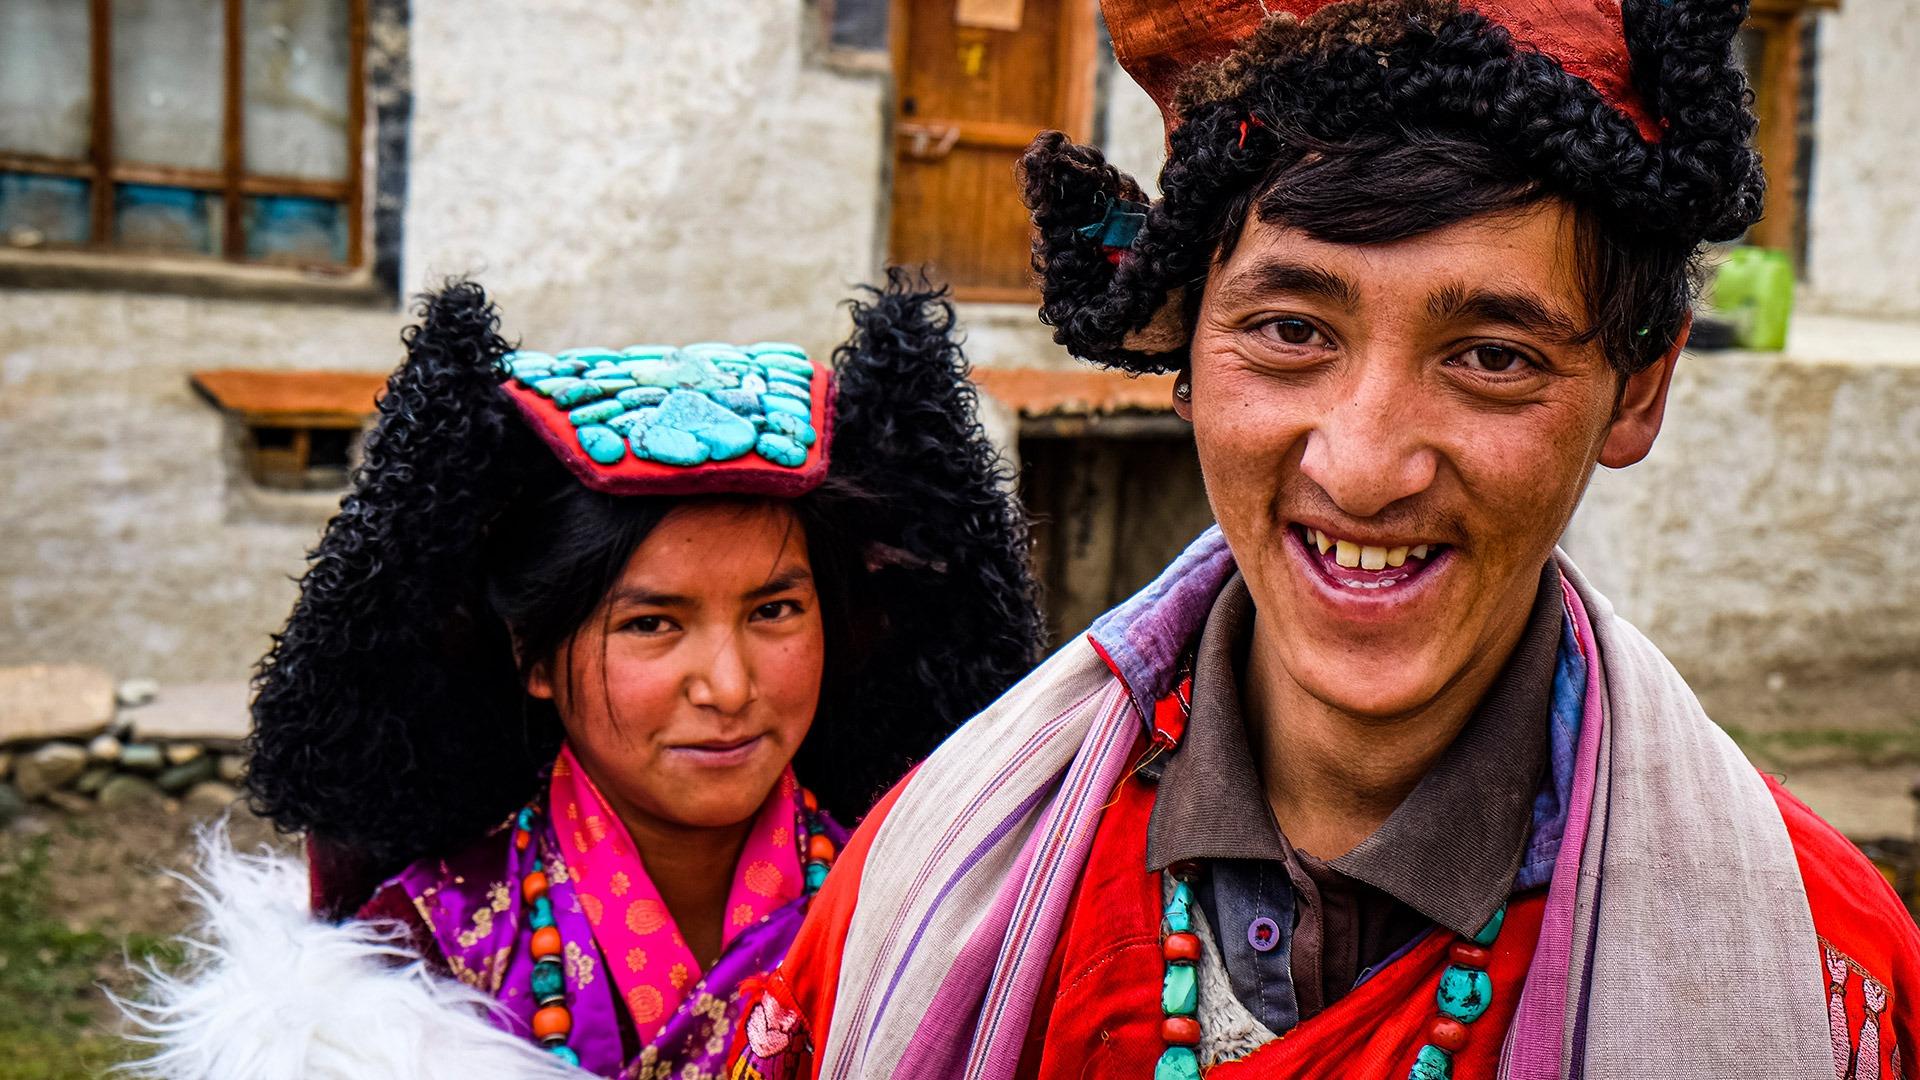 Man and woman in traditional festive attire, Ladakh, India